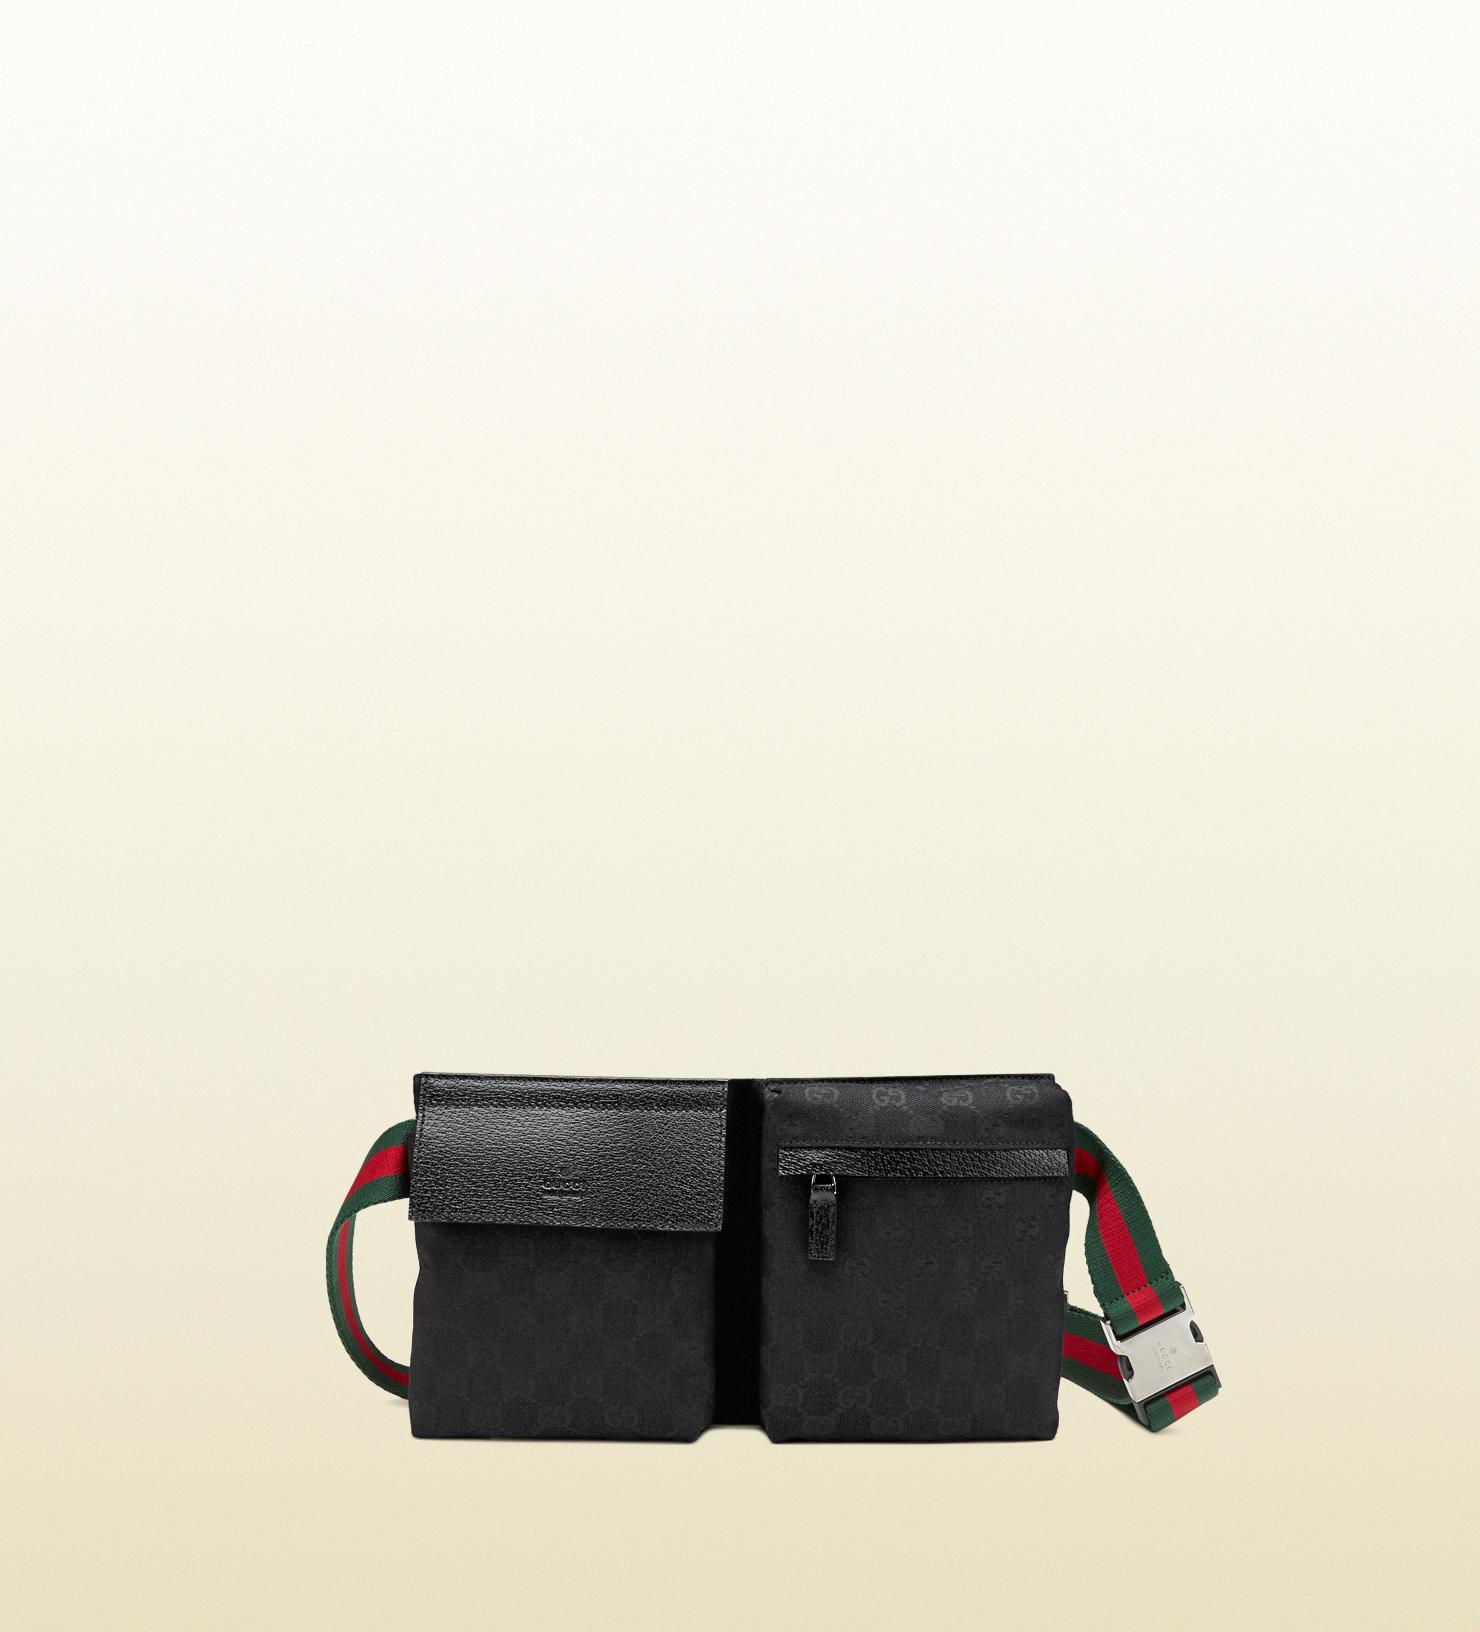 980f52b4a141 Gucci Original Gg Canvas Belt Bag in Black for Men - Lyst